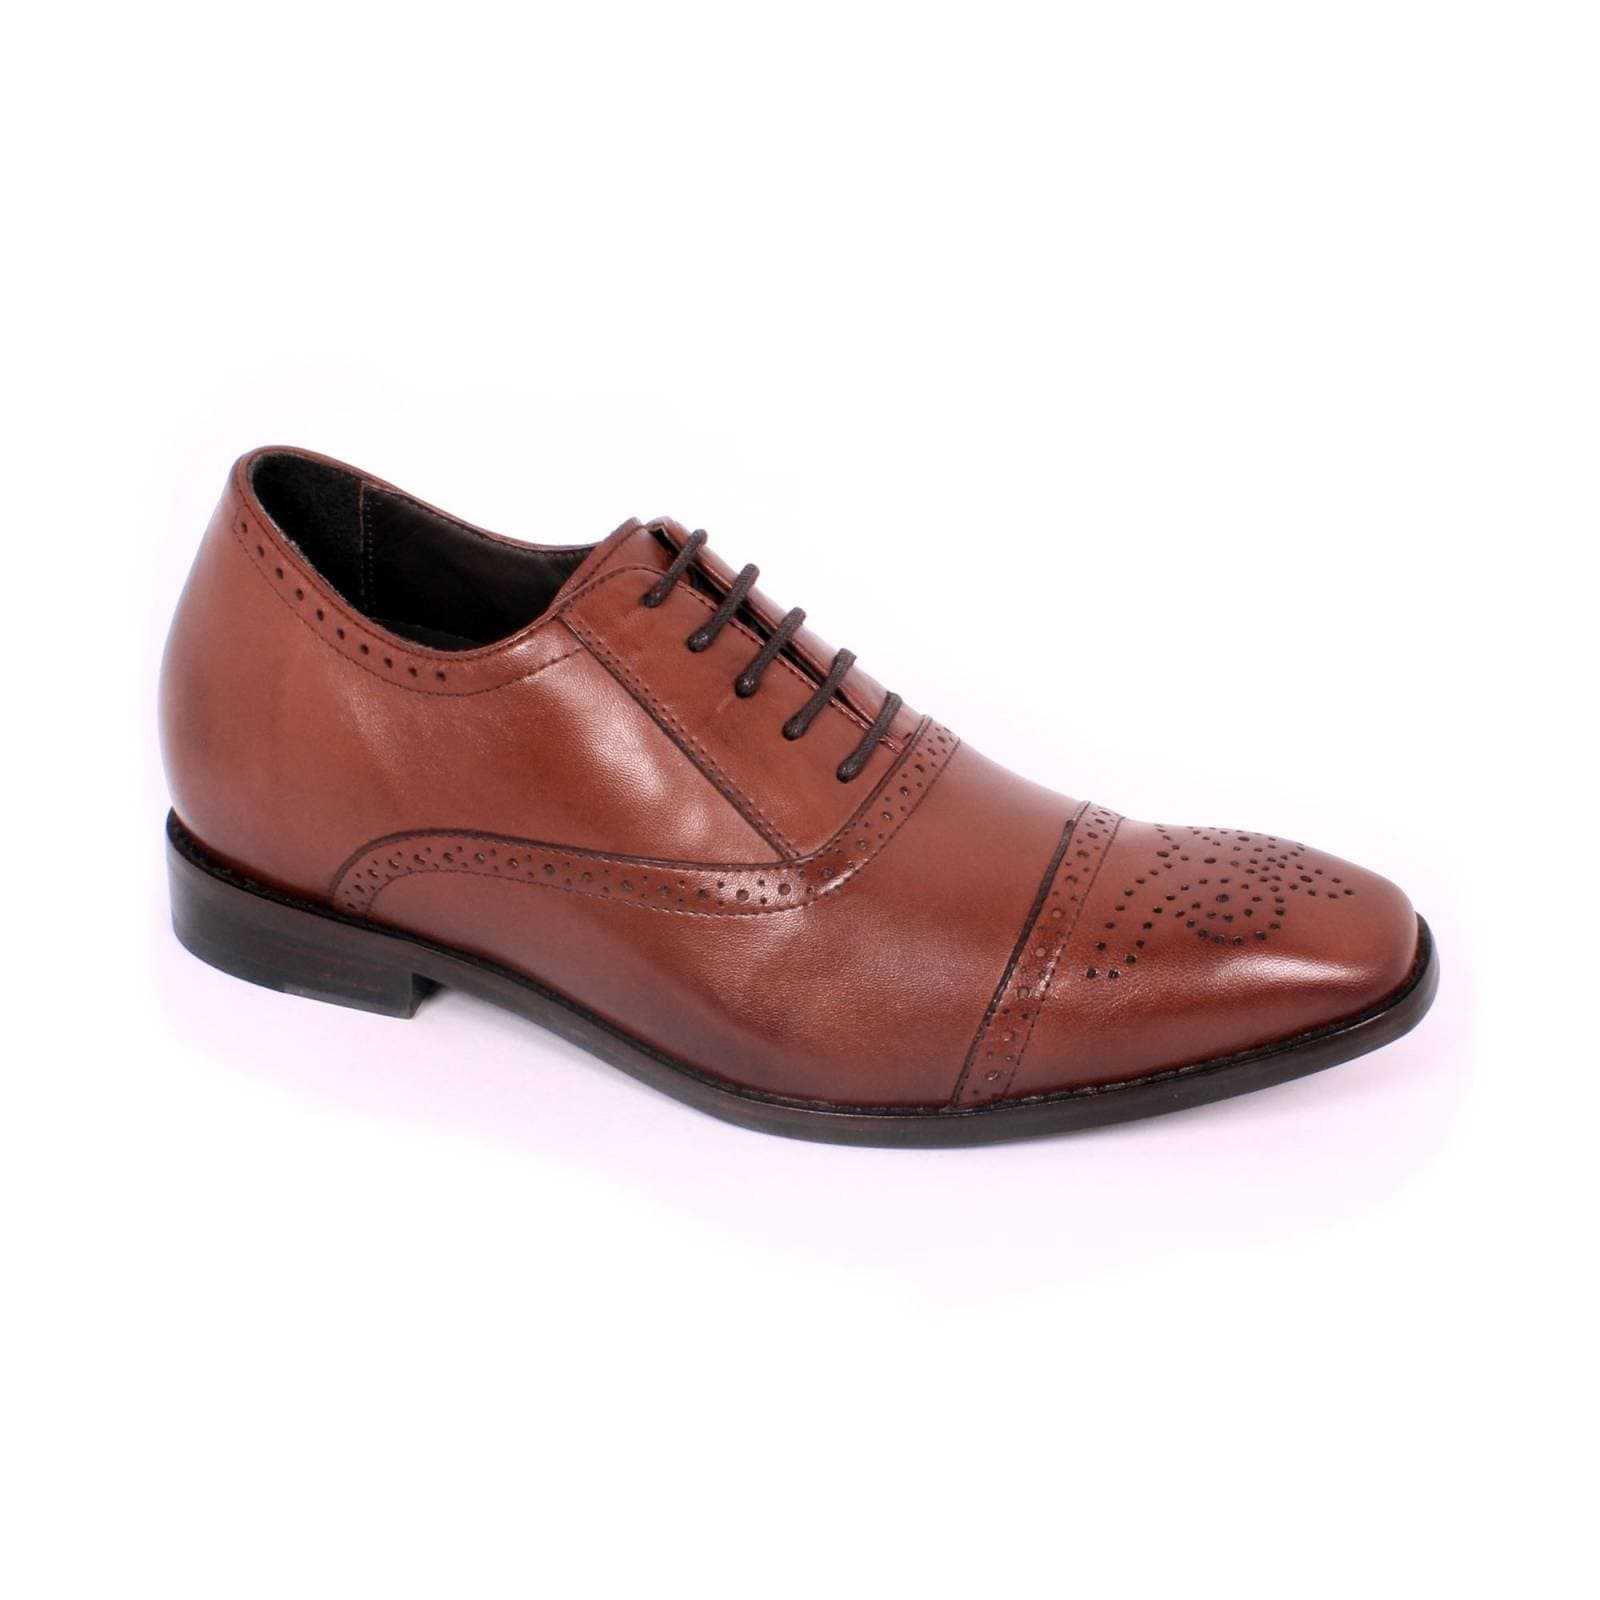 Zapato Formal British Café Max Denegri +7cms De Altura